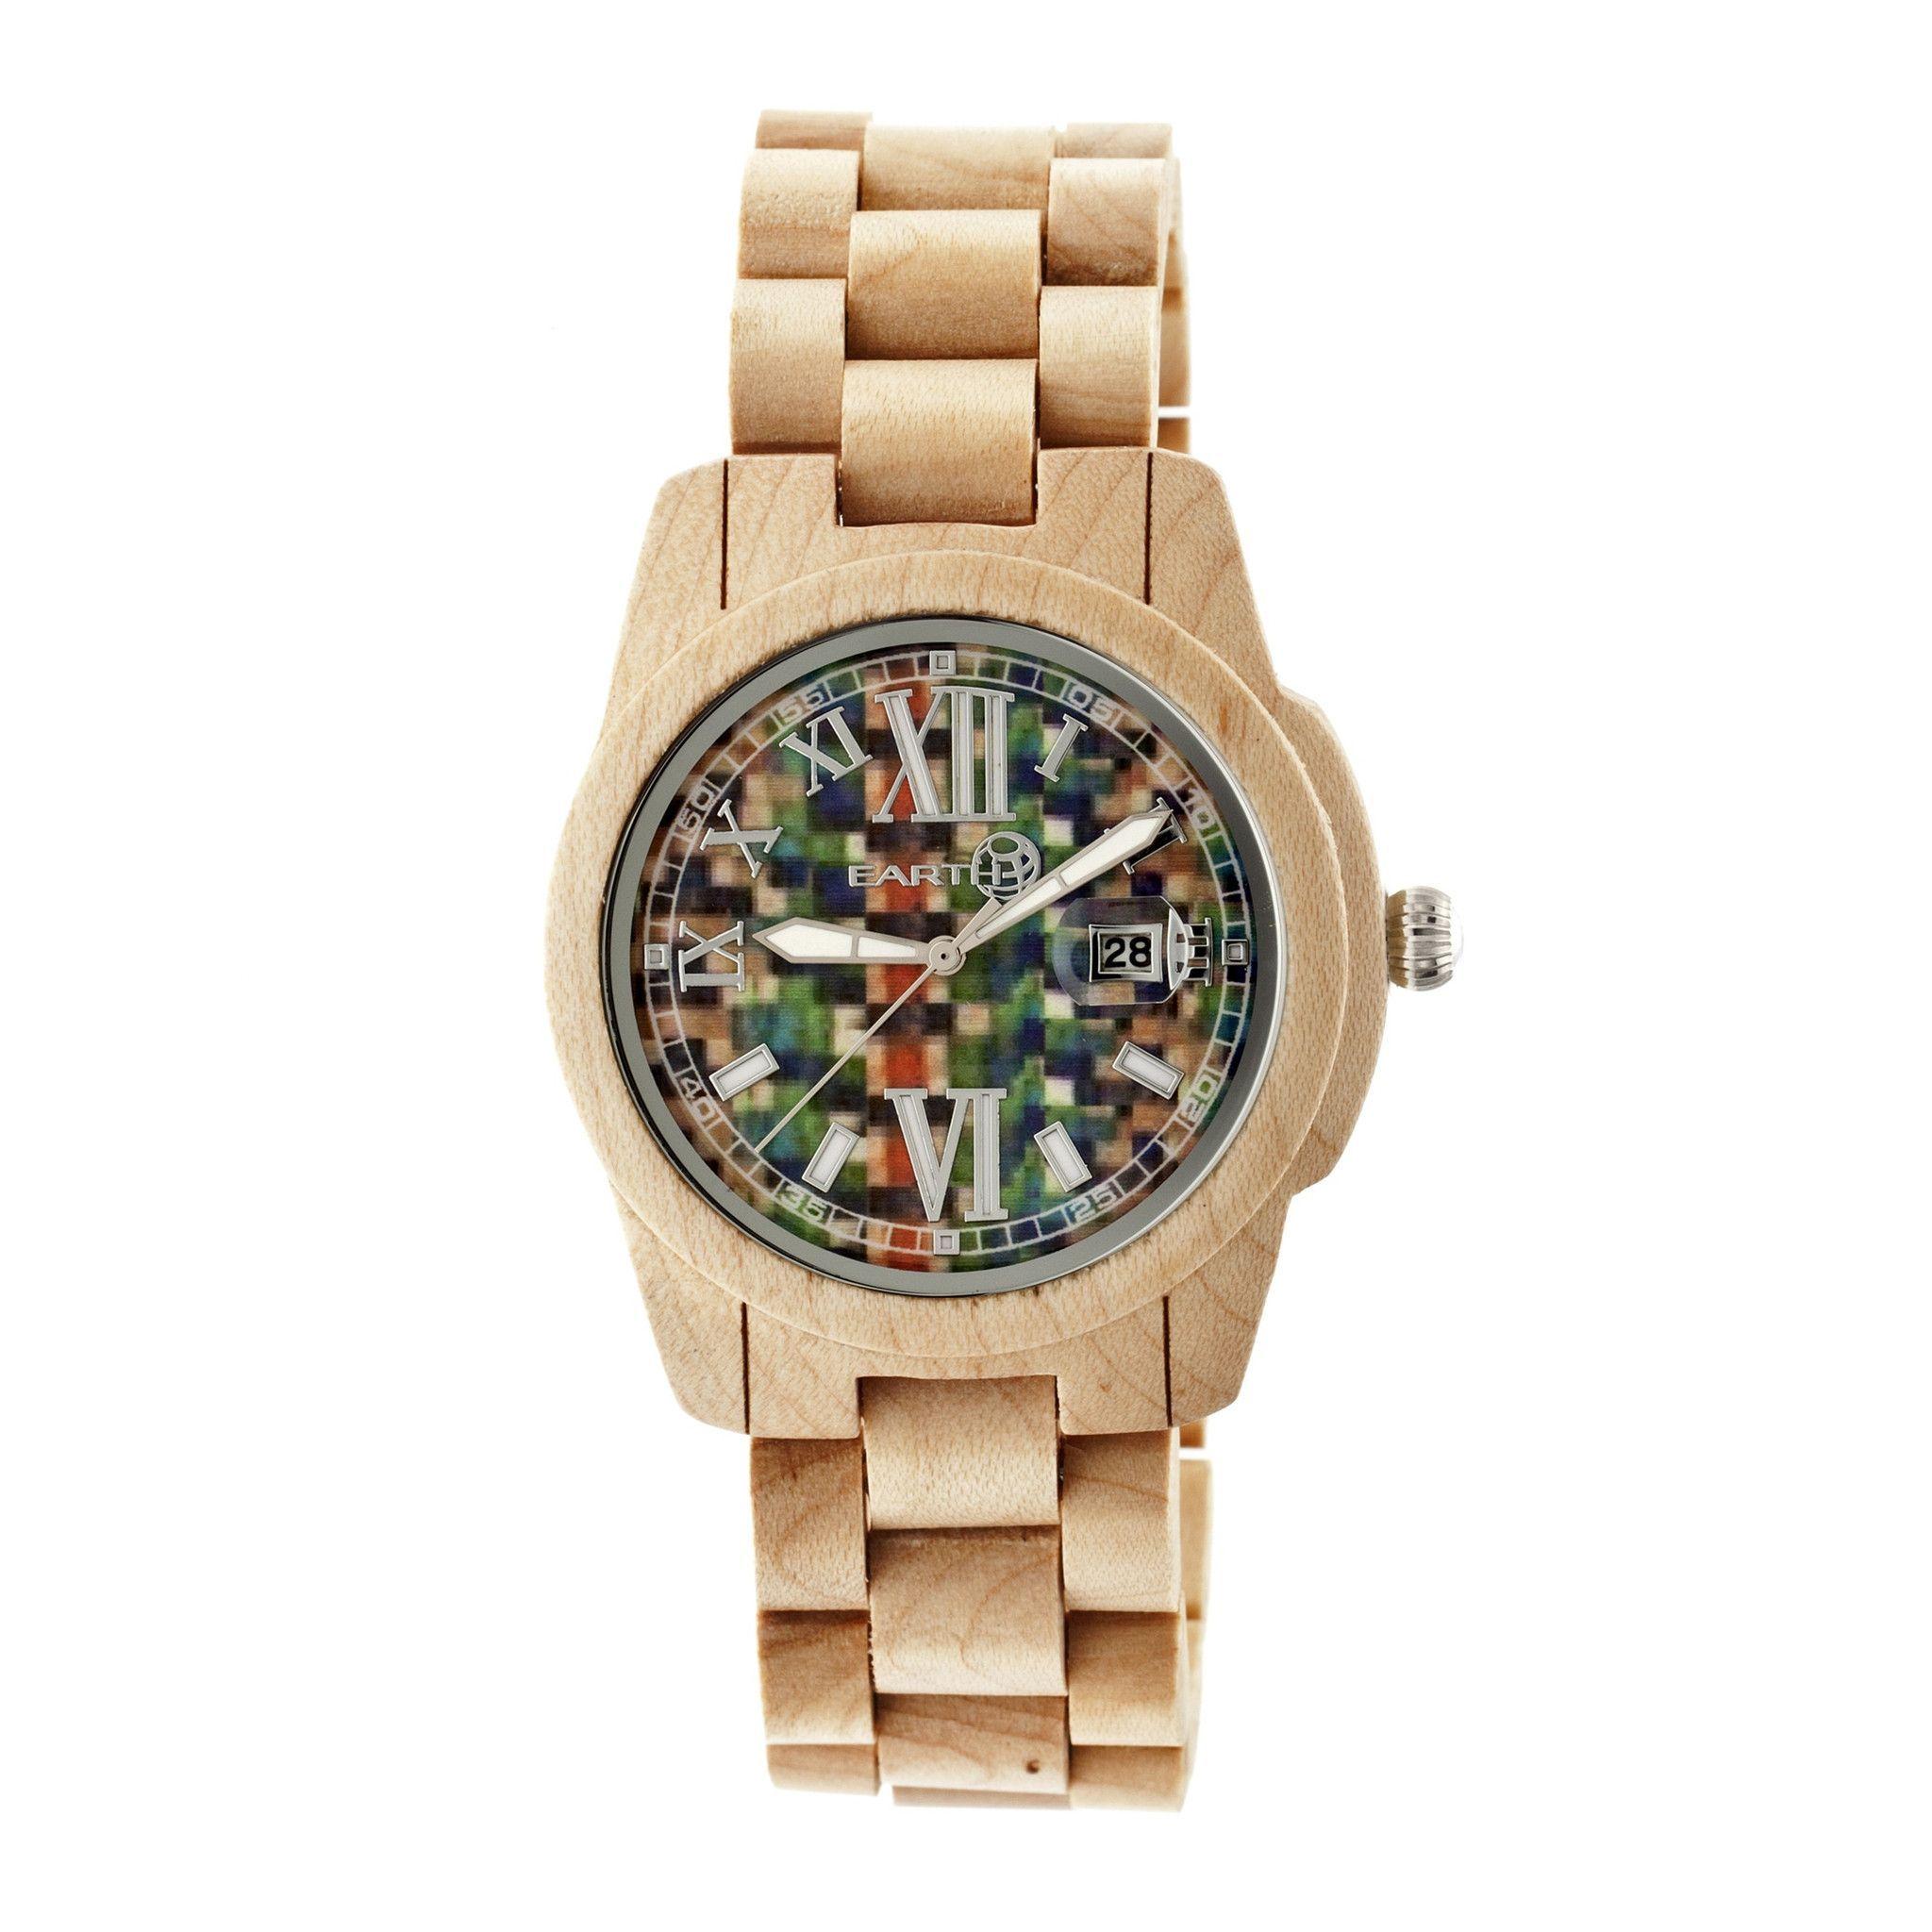 Earth Ew1505 Heartwood Watch